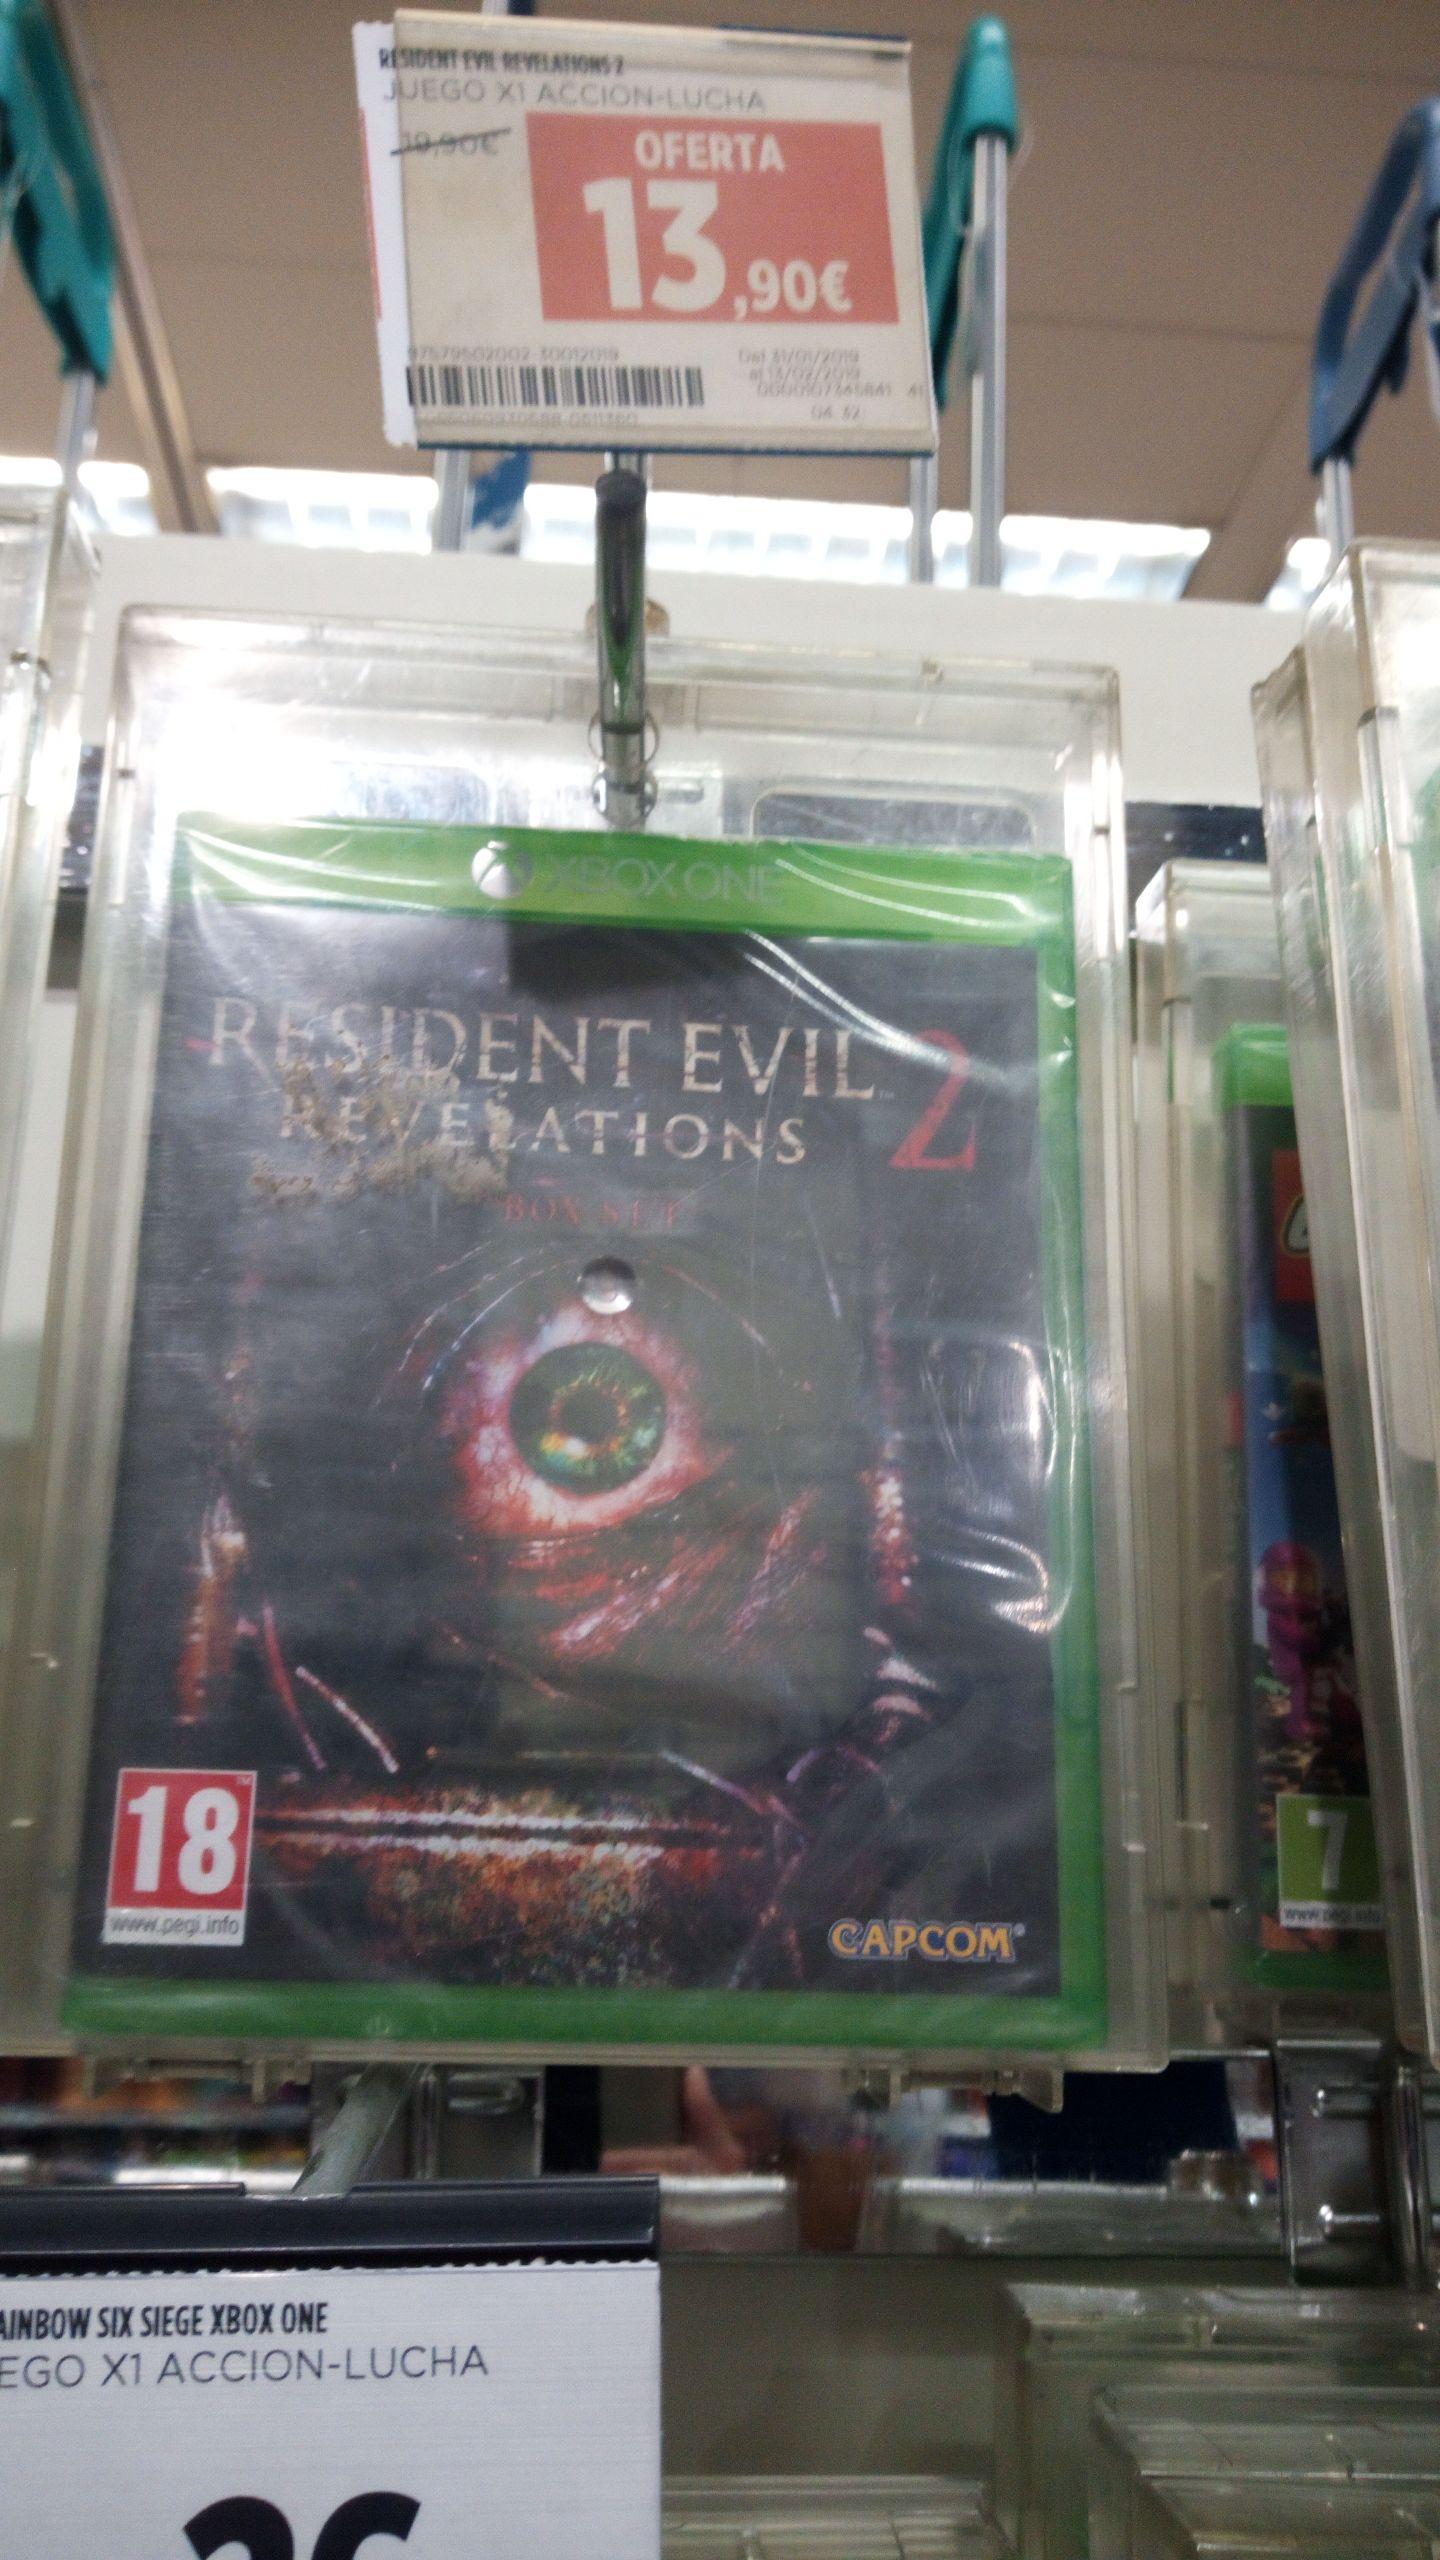 Resident Evil Revelations 2 Box set Xbox One Hipercor los arcos (Sevilla)